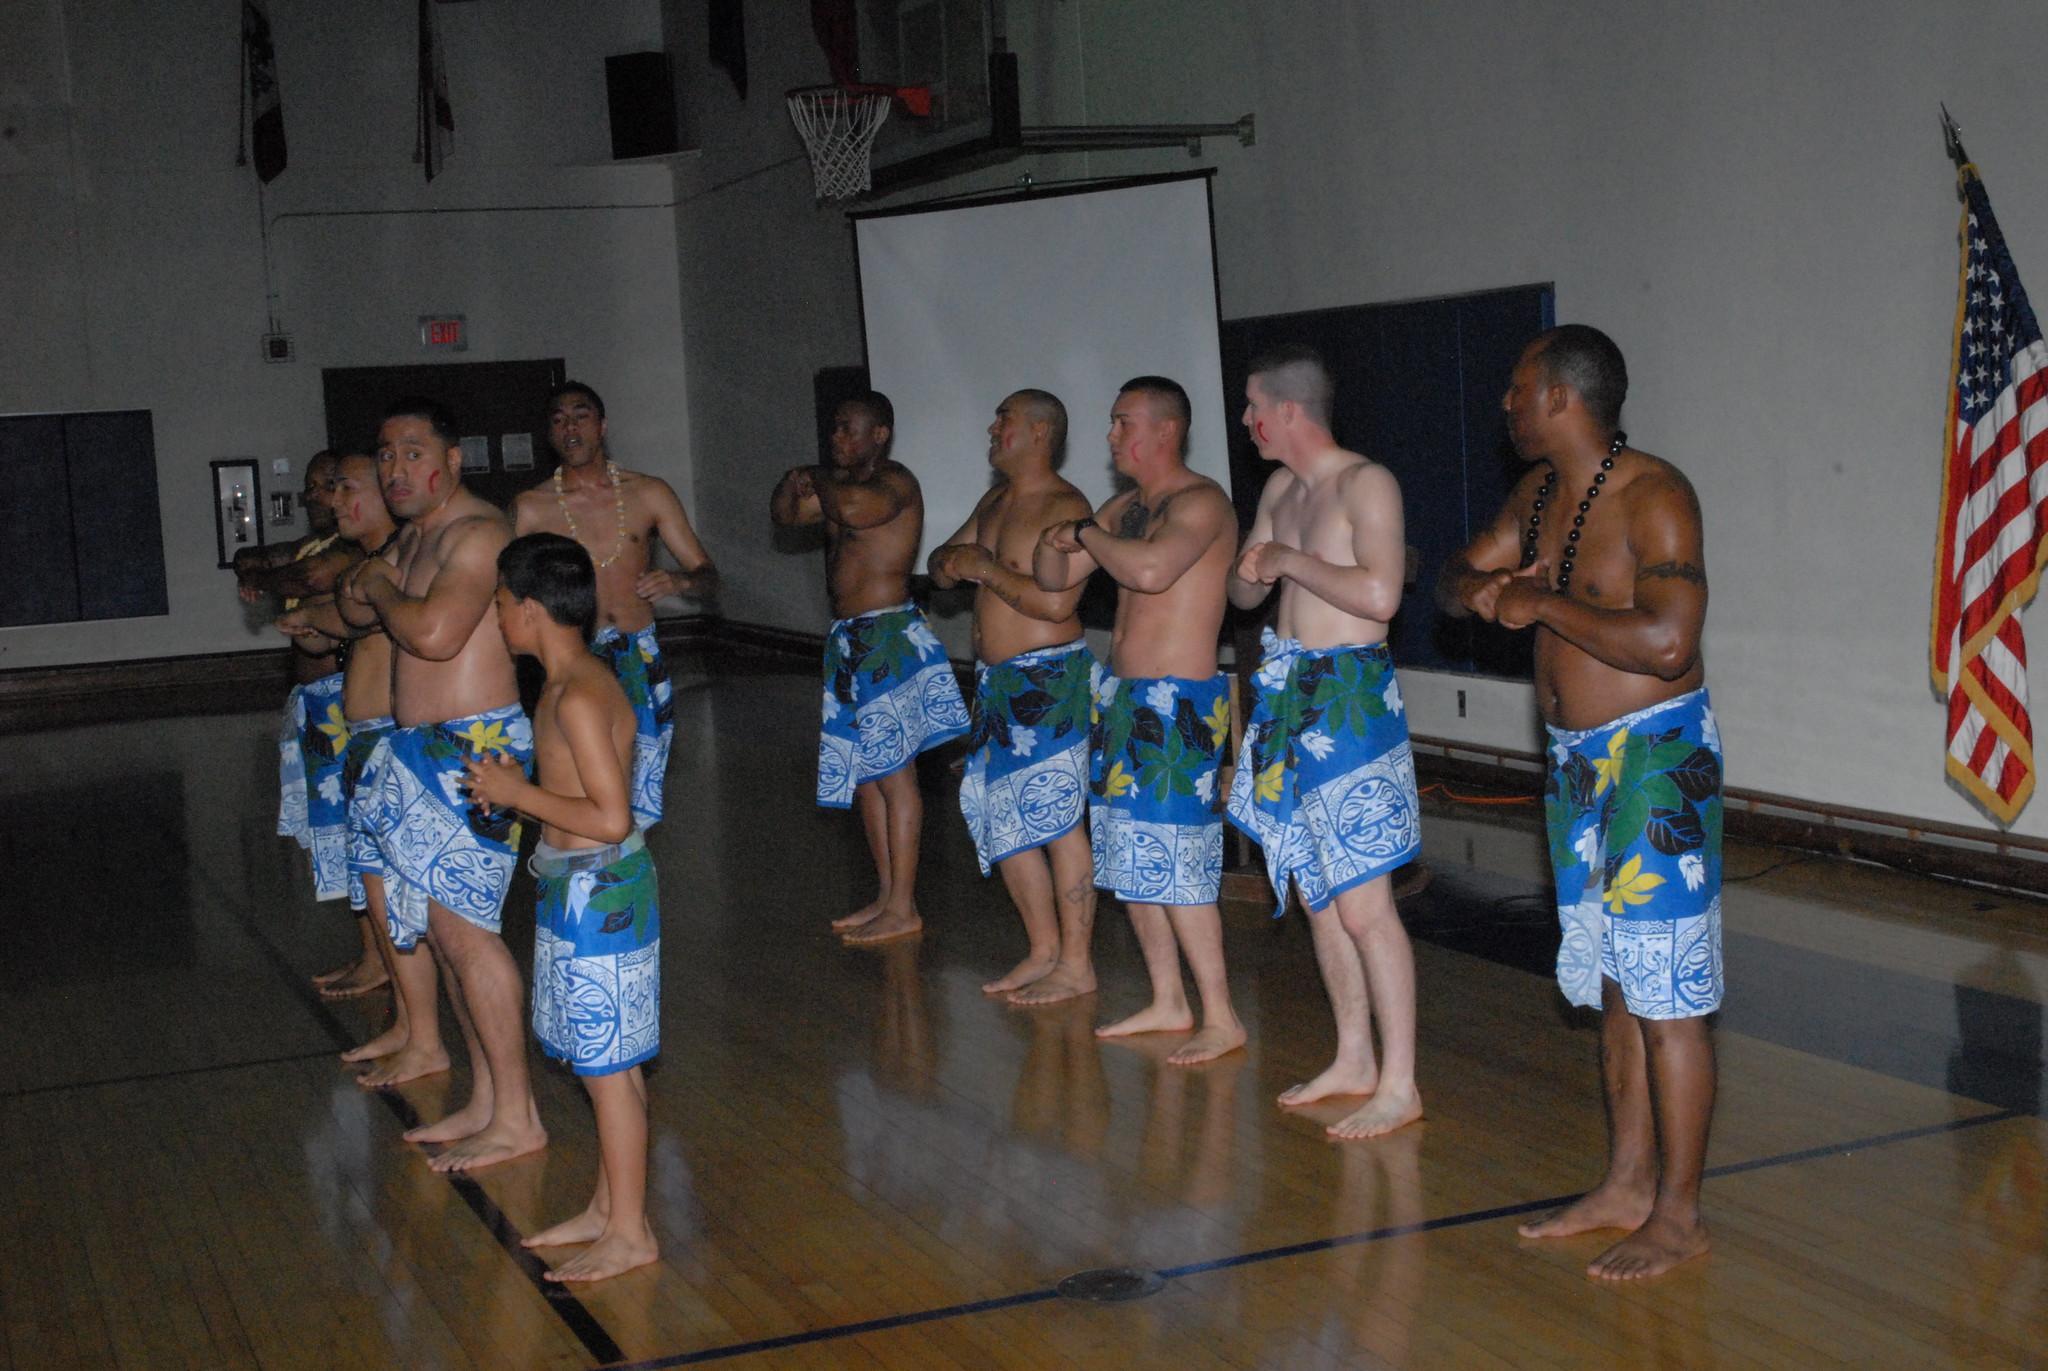 California asian pacific islander